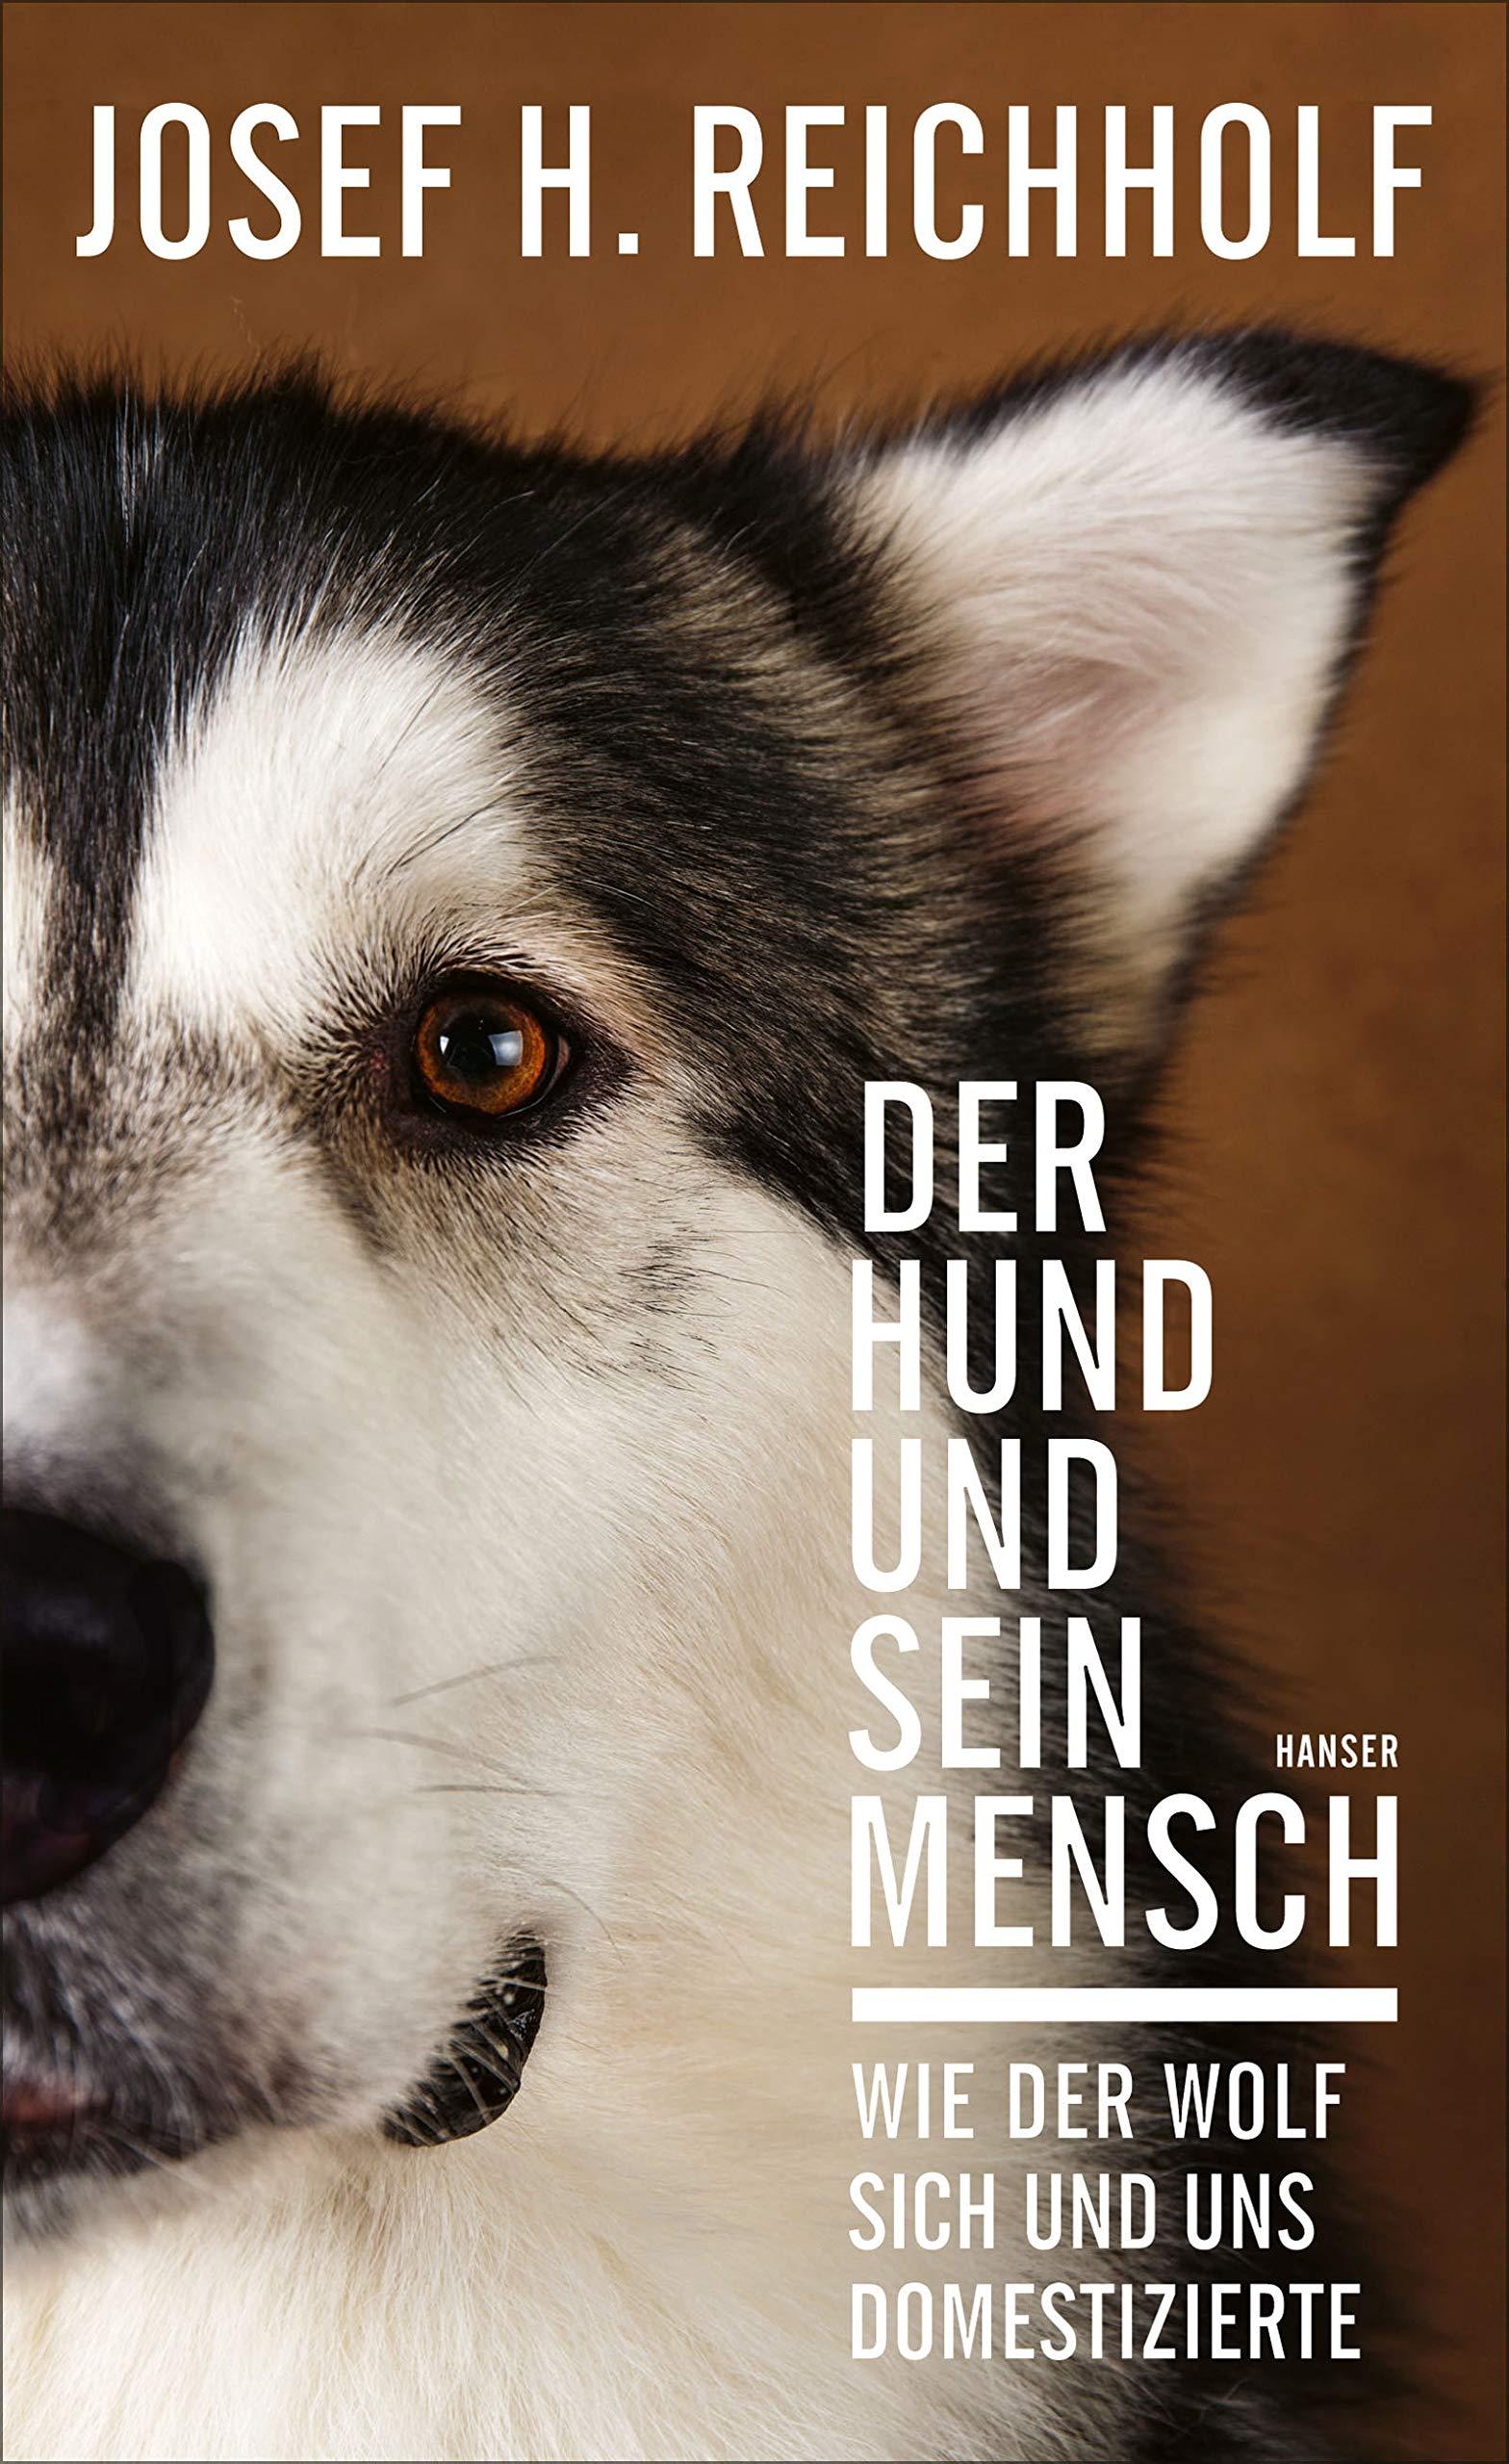 Hund Hund, Thomas